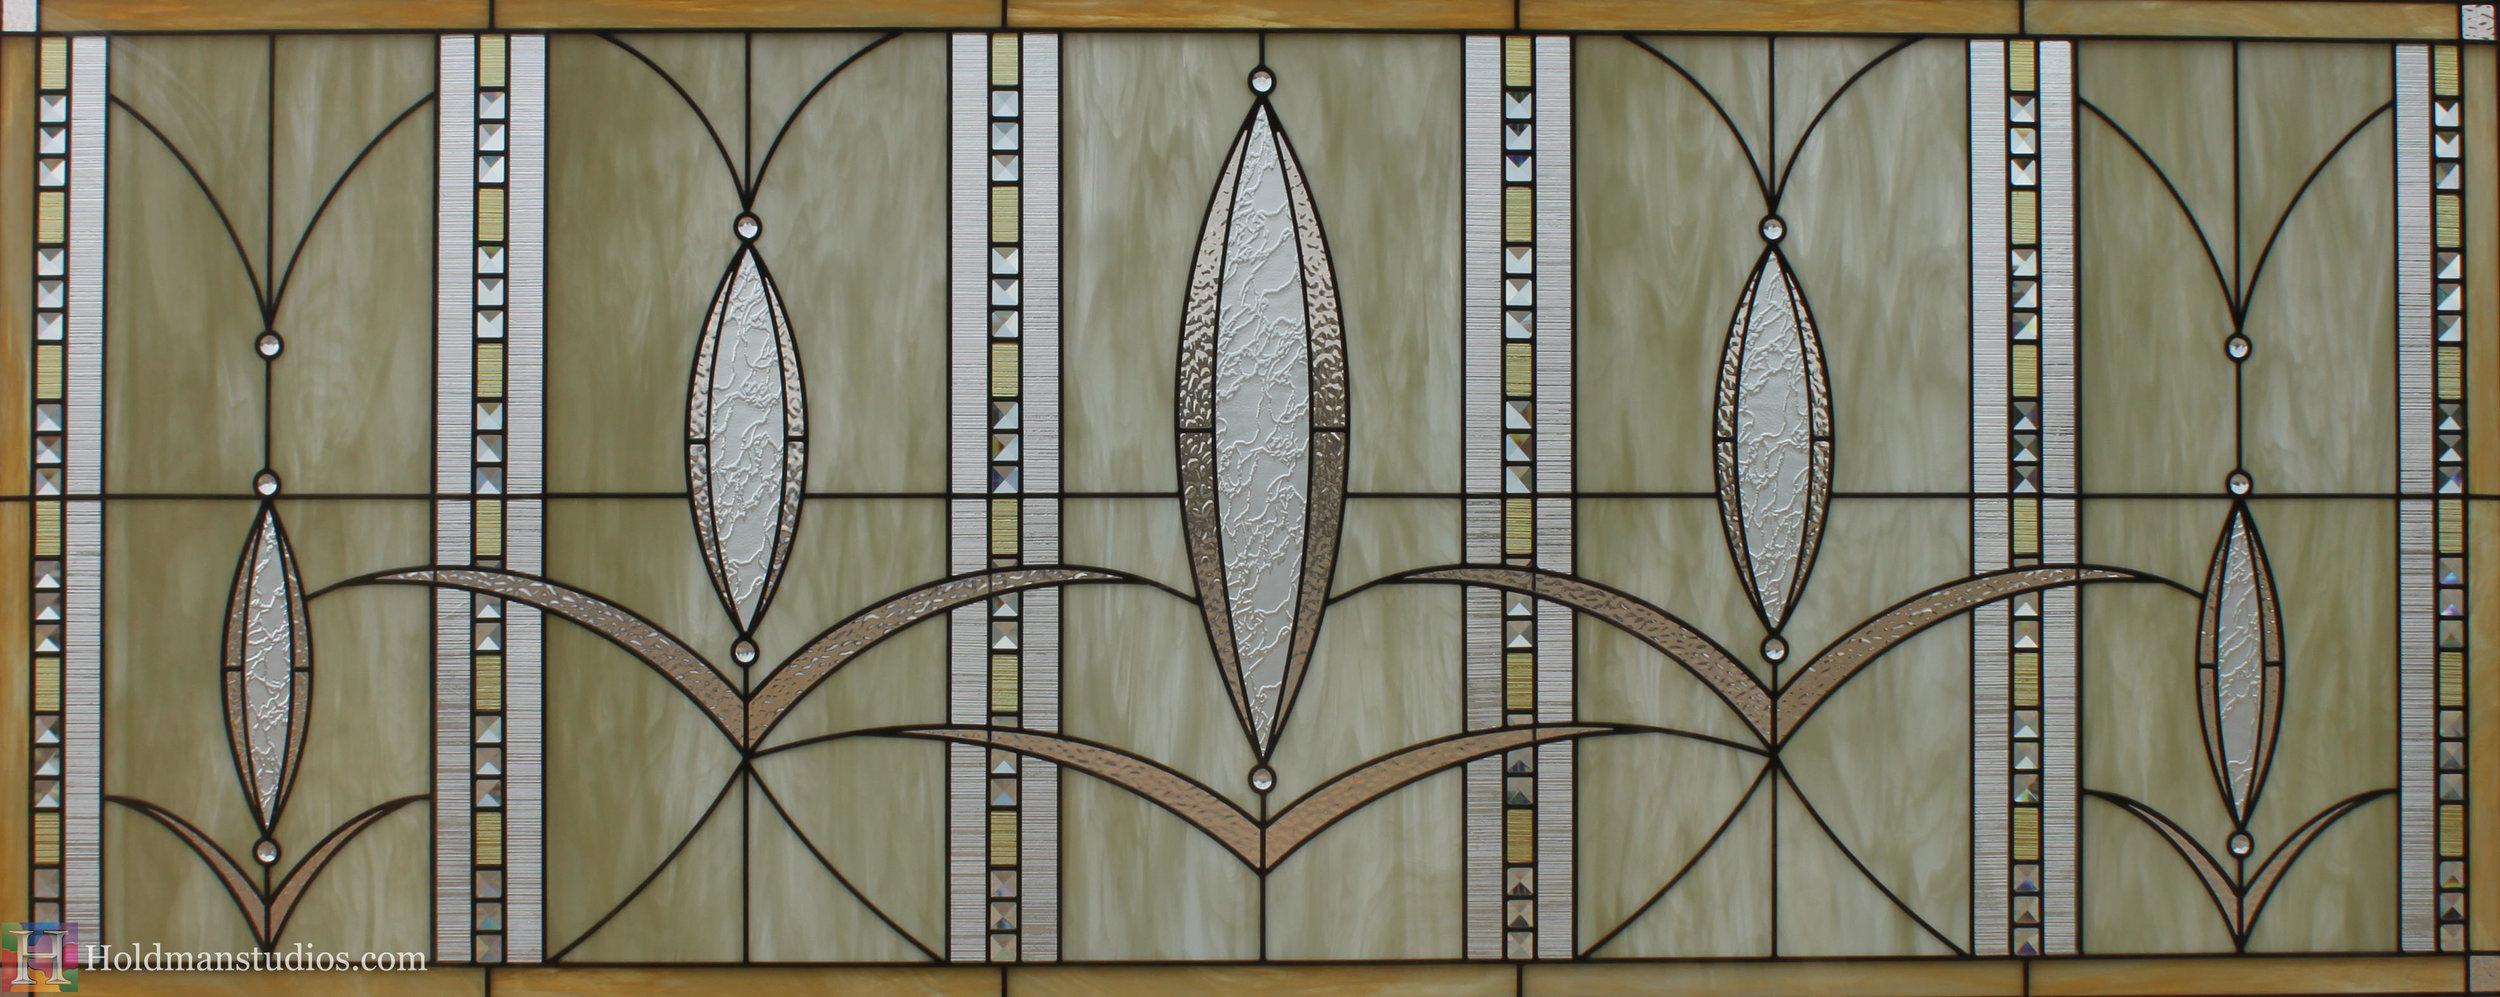 Stained Glass_Cordoba_Arintina_Temple.jpg